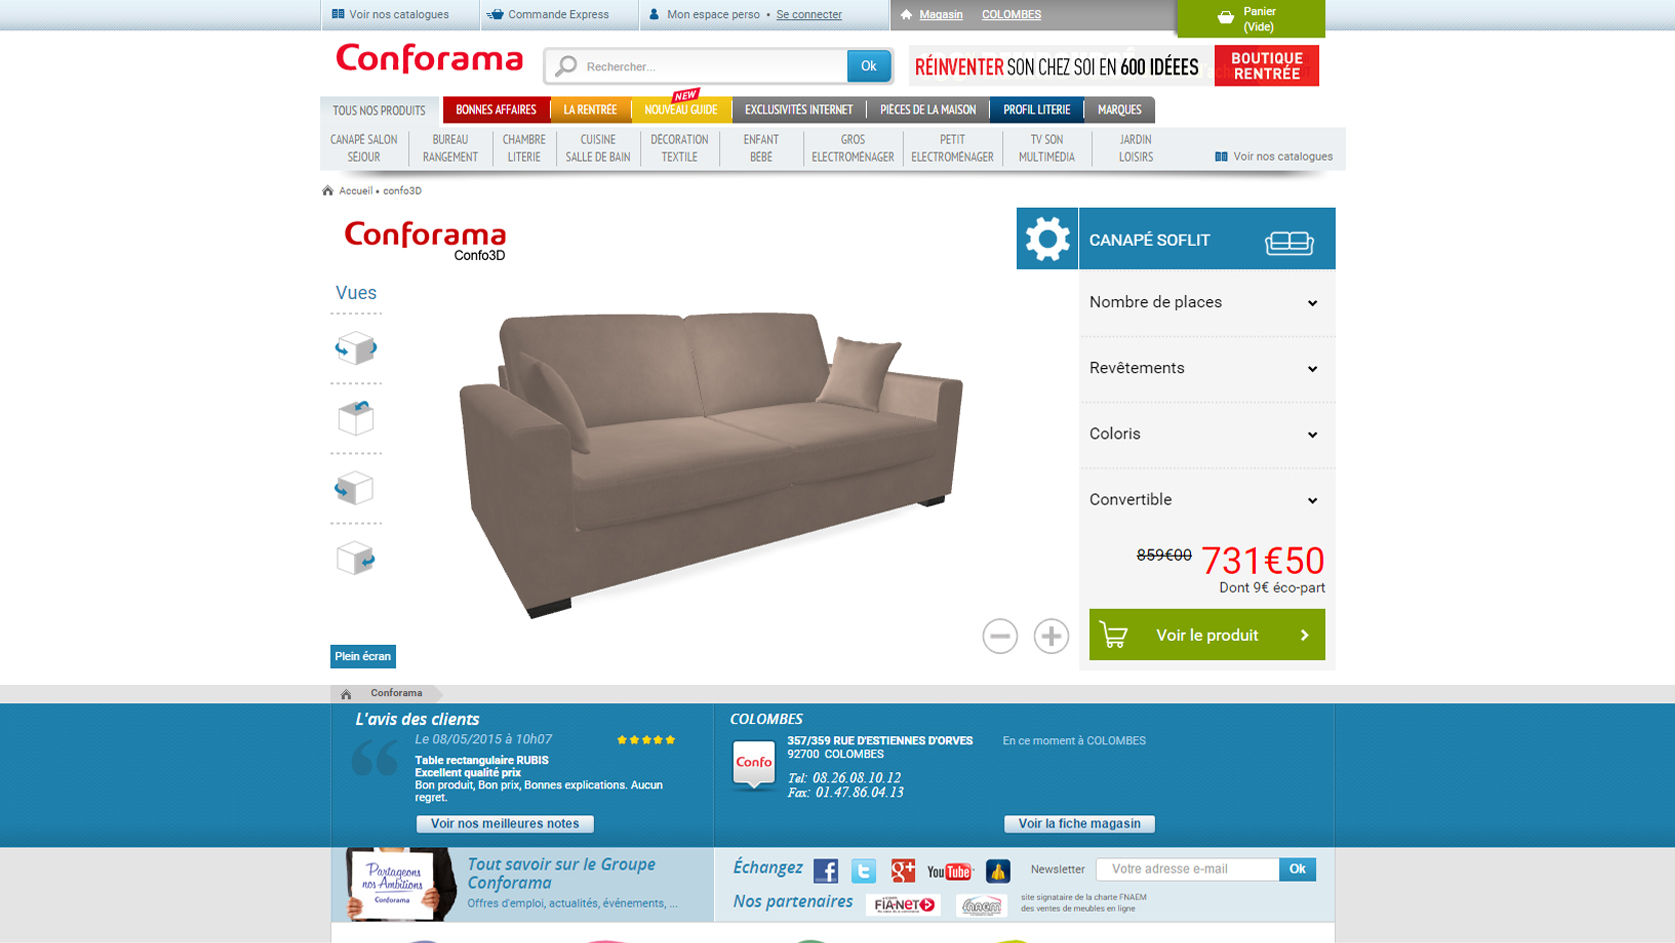 Image Conforama 3Dswipe